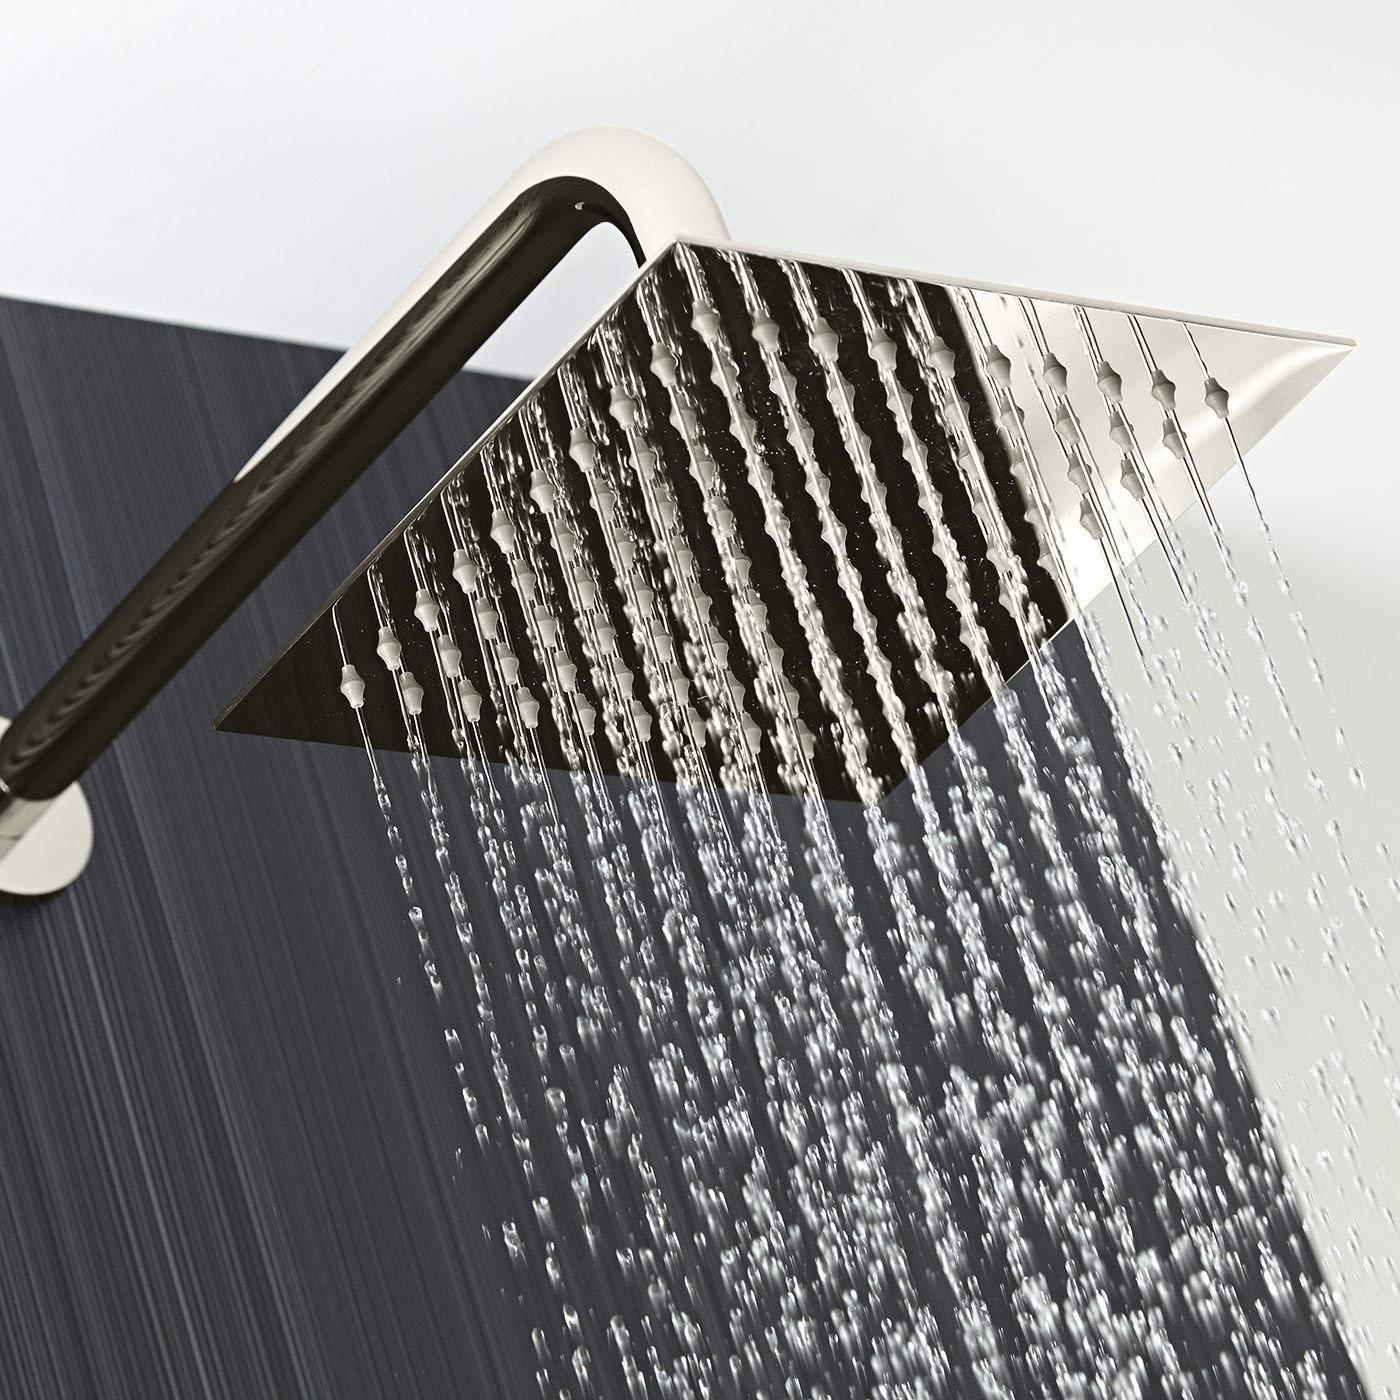 Fontana Liverpool Wall Mount Thermostatic Rainfall Shower Set System